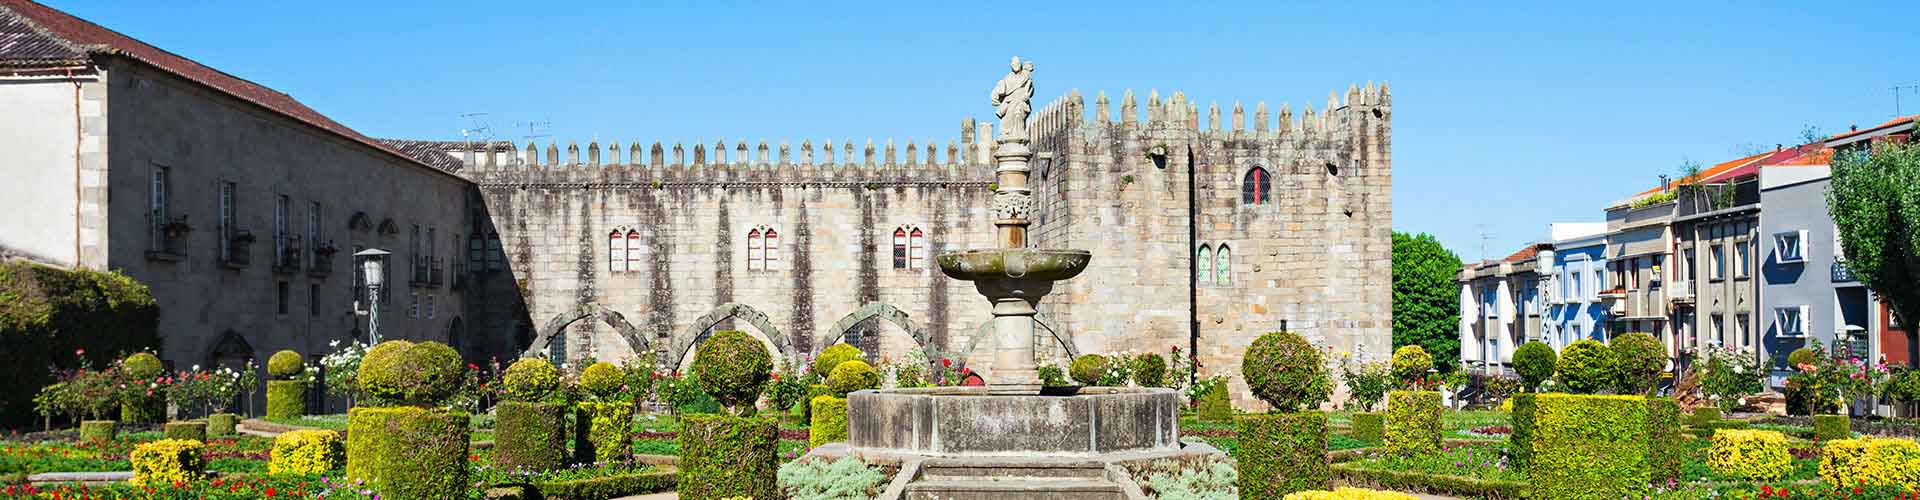 Braga - Chambres à Braga. Cartes pour Braga, photos et commentaires pour chaque chambre à Braga.